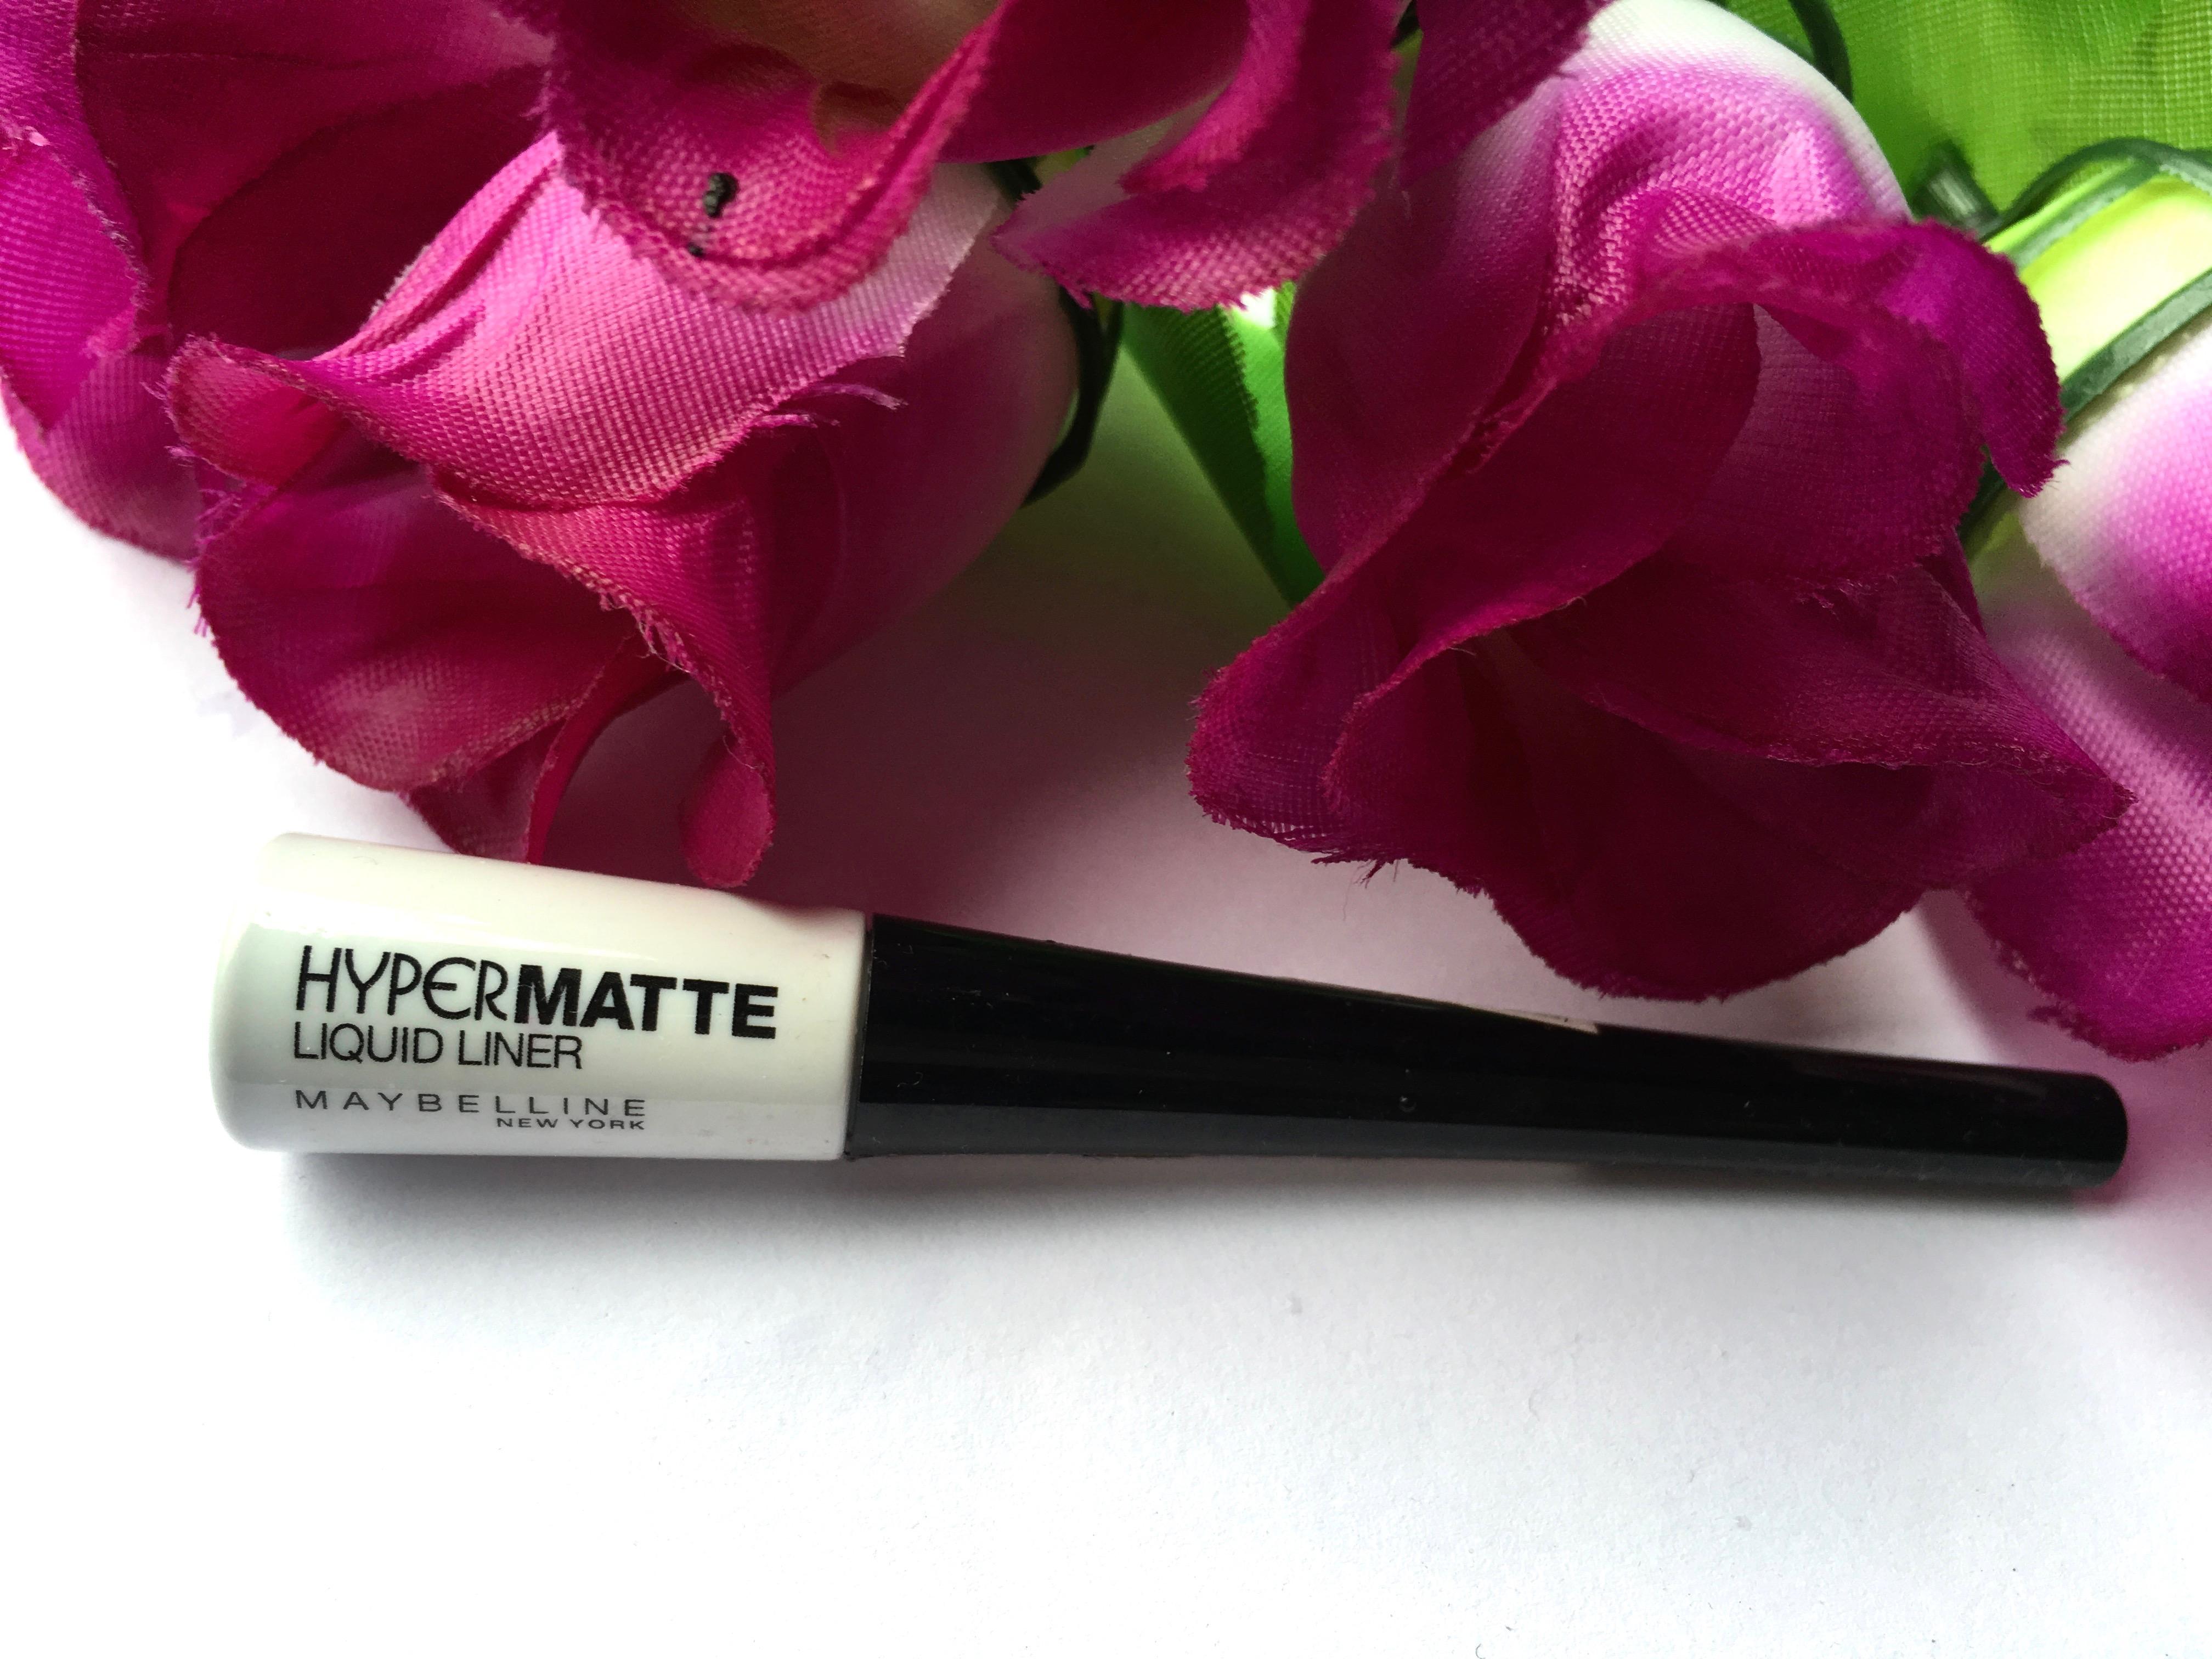 Maybelline Hyper Matte Liquid Liner Review Swatches Ink Eye Black